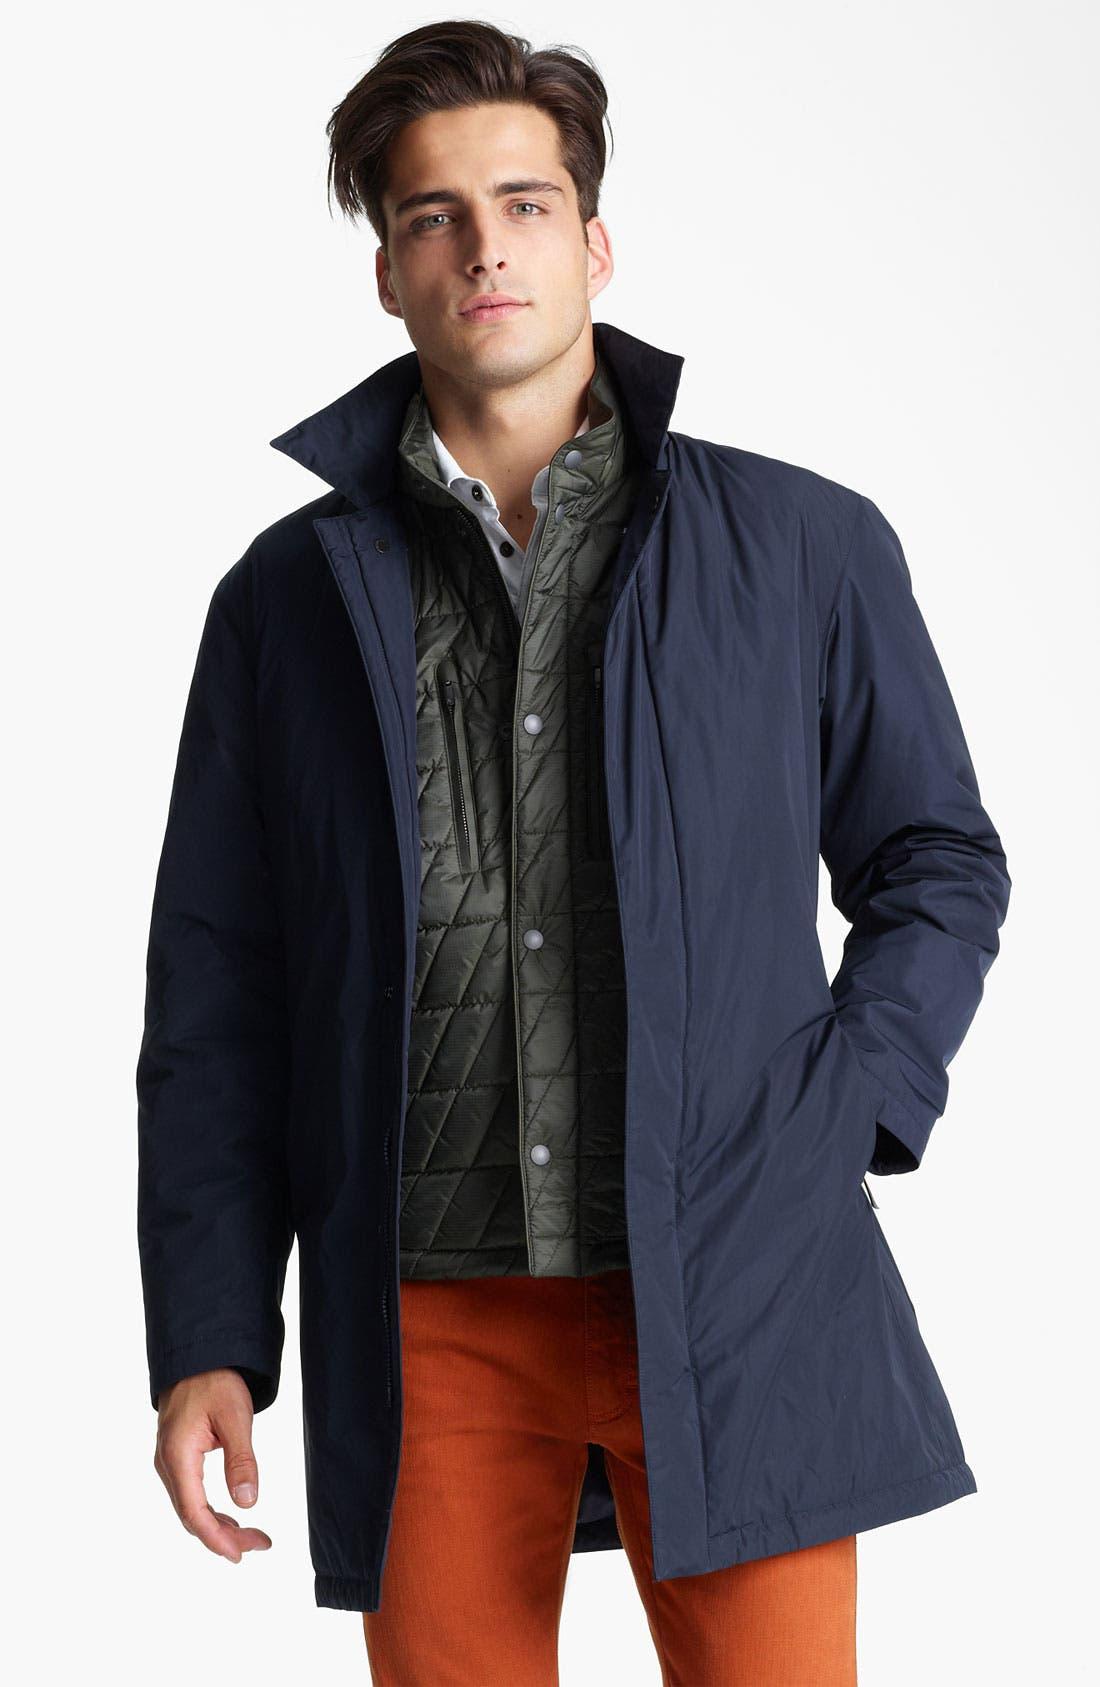 Alternate Image 1 Selected - Zegna Sport 'City' Raincoat